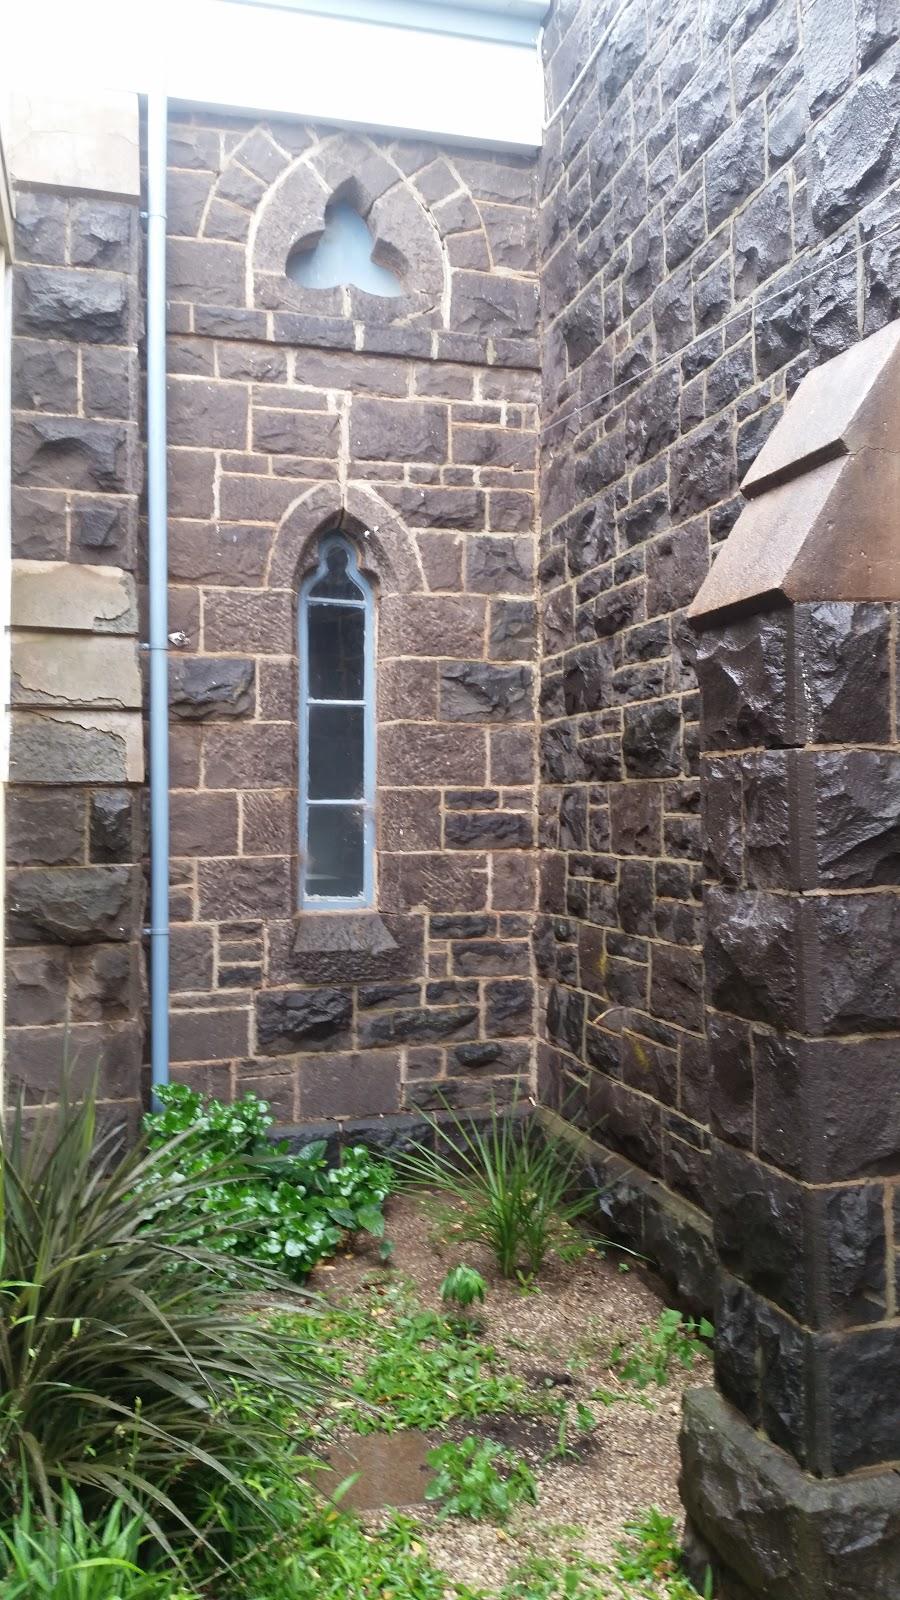 Melton Uniting Church | church | 17 Yuille St, Melton VIC 3337, Australia | 0397460488 OR +61 3 9746 0488